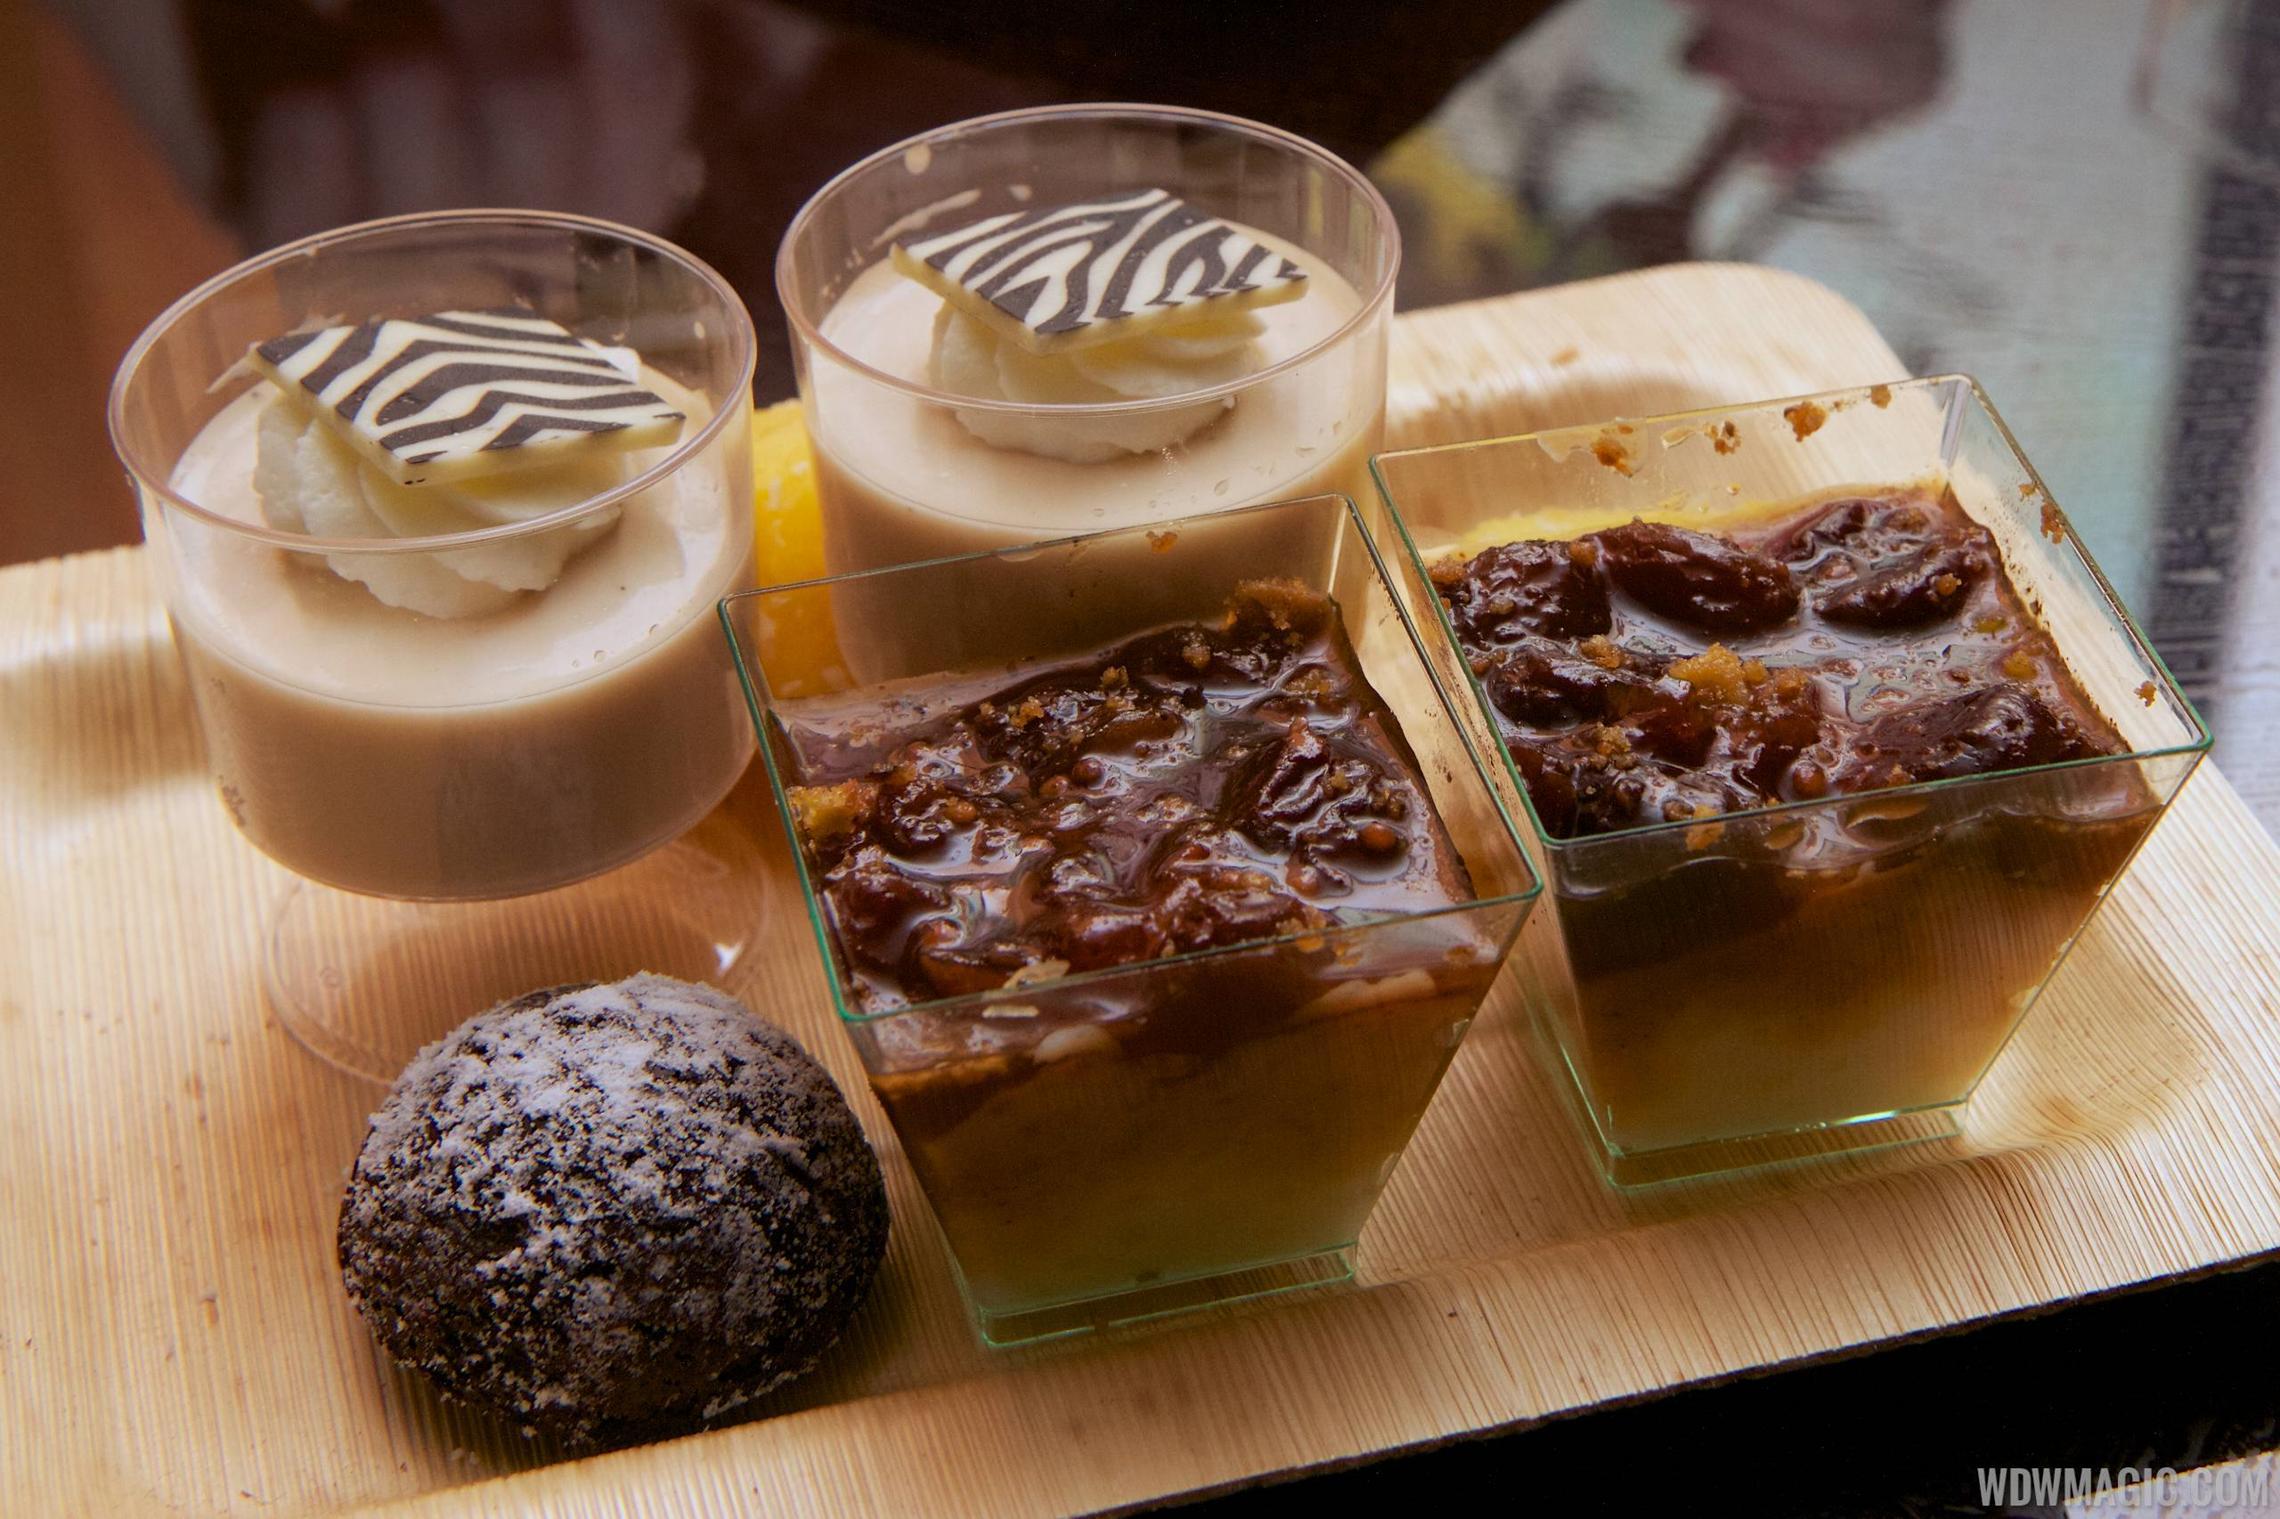 Harambe Nights - Desserts